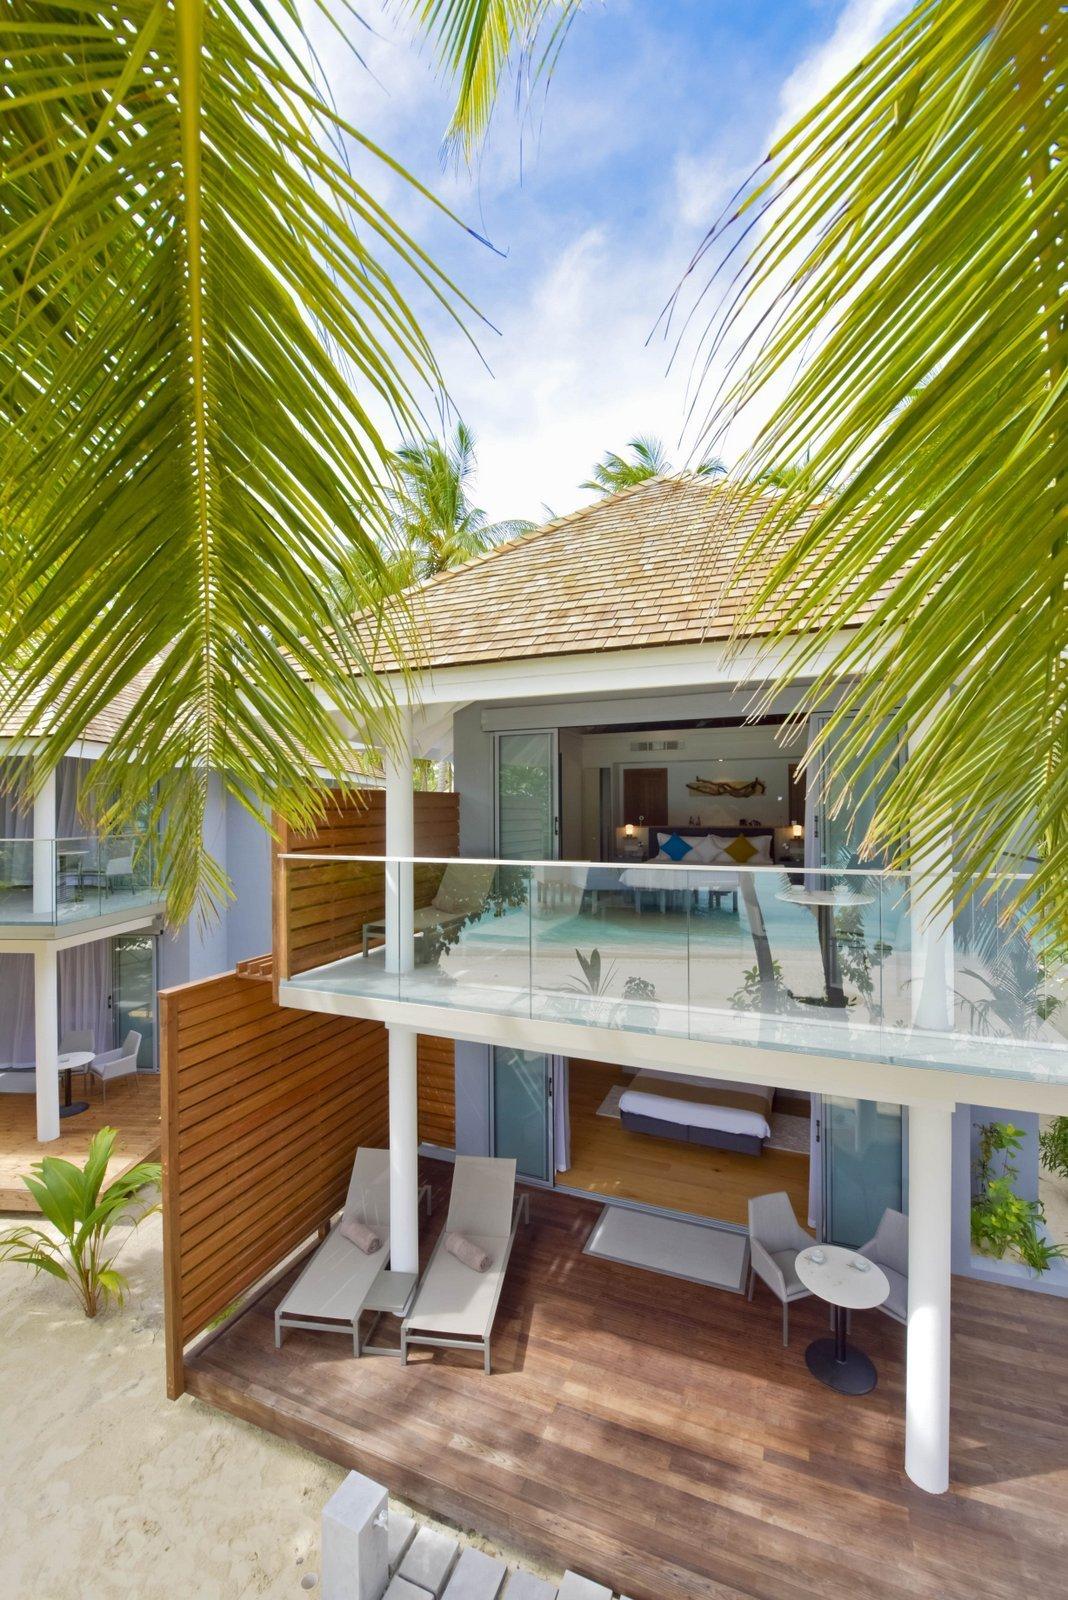 Мальдивы, отель Kuramathi Maldives, номер Two Bed room Beach Houses